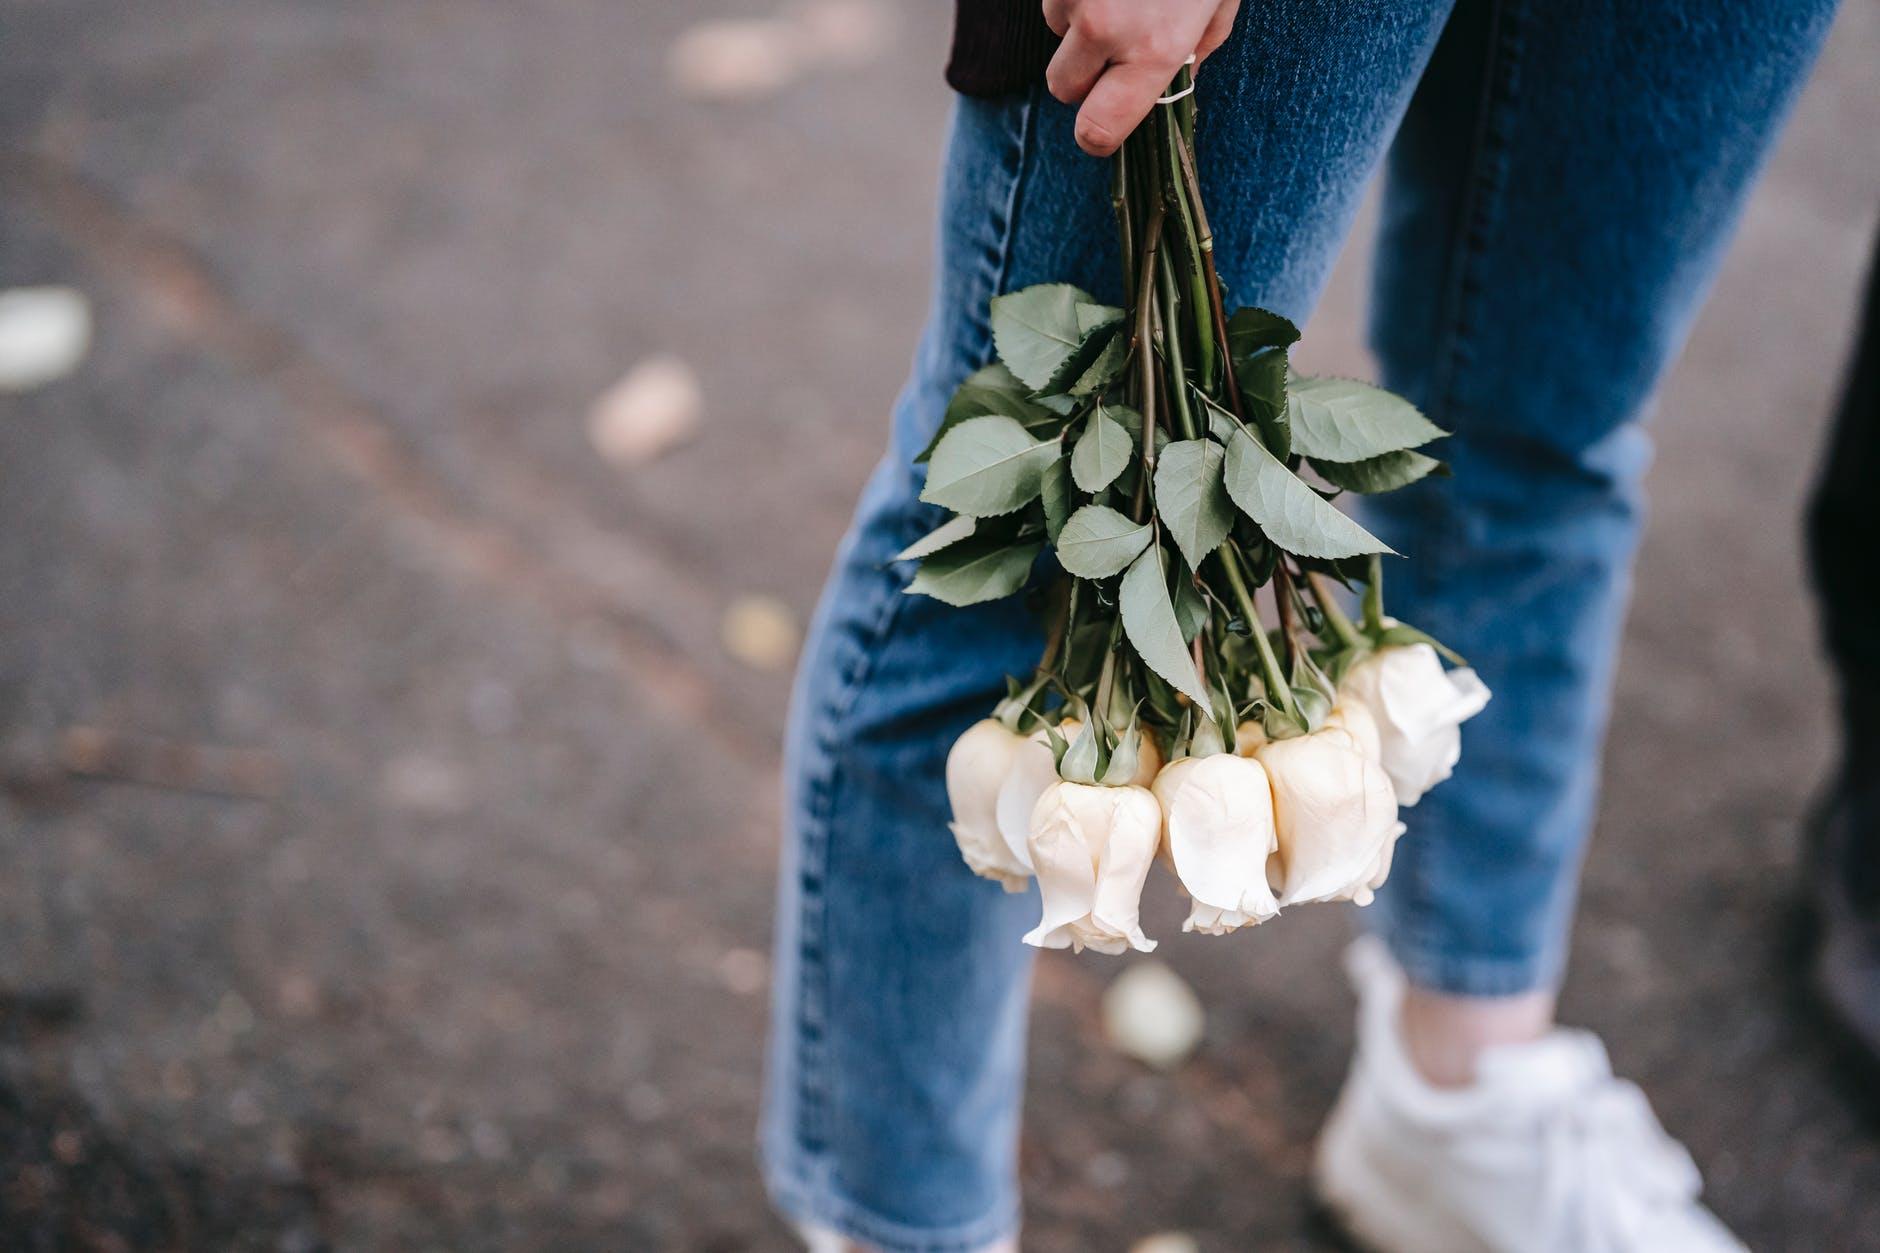 Za nekoliko znakova  woman in jeans with bouquet of fresh white roses